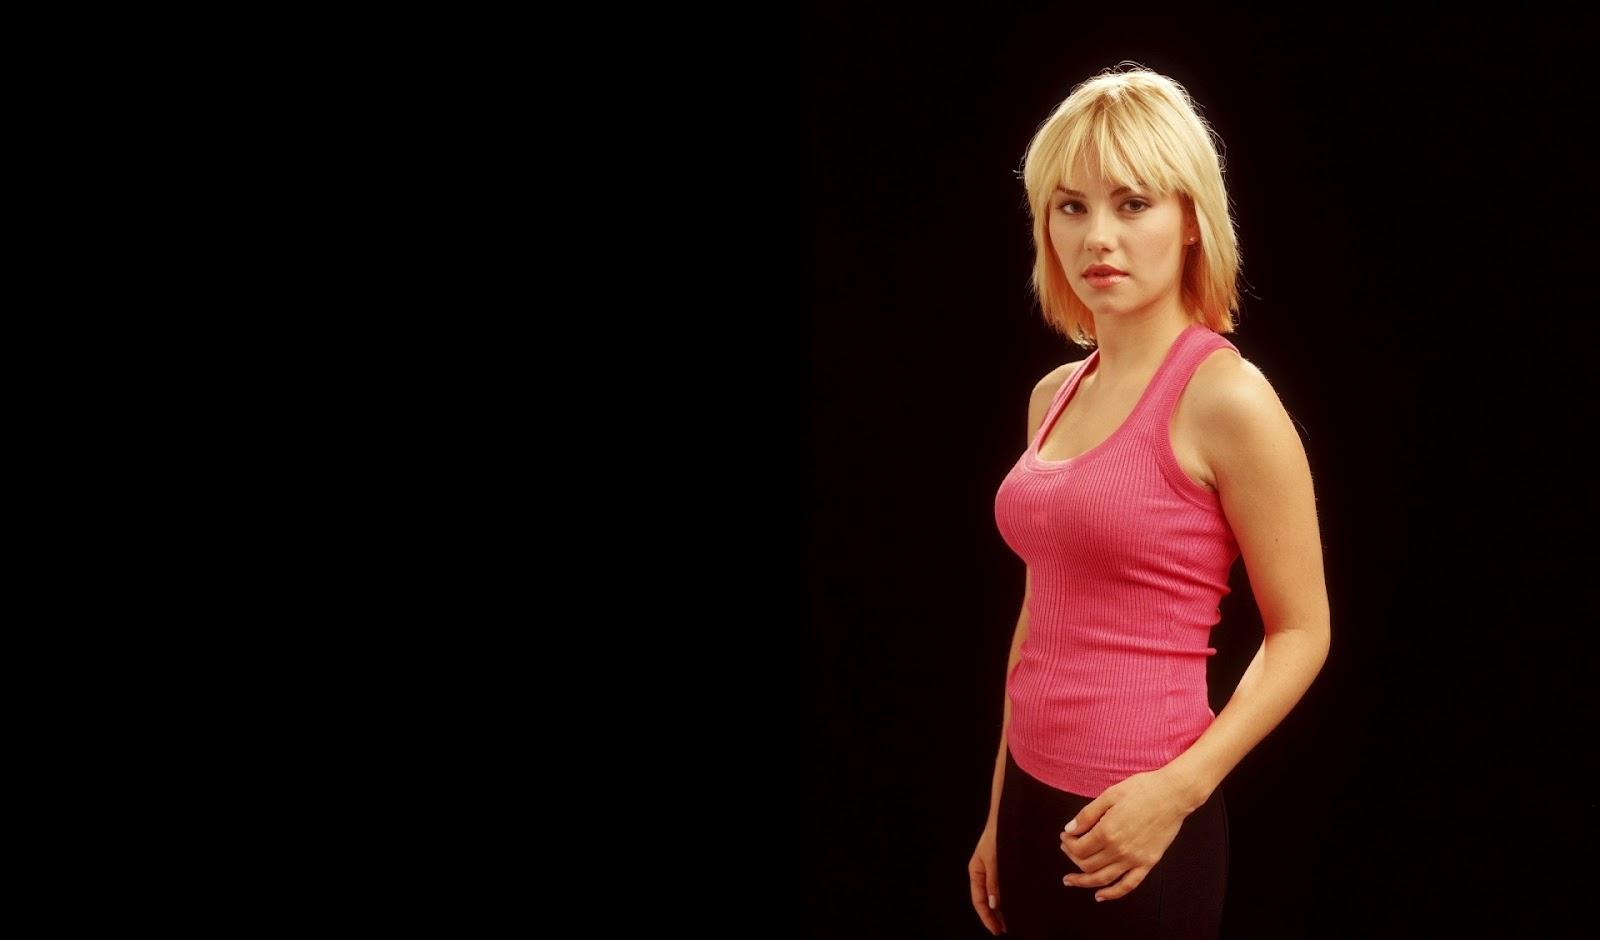 Sexy Elisha Cuthbert Full Hd Wallpapers 1080P  Top Pix-6550